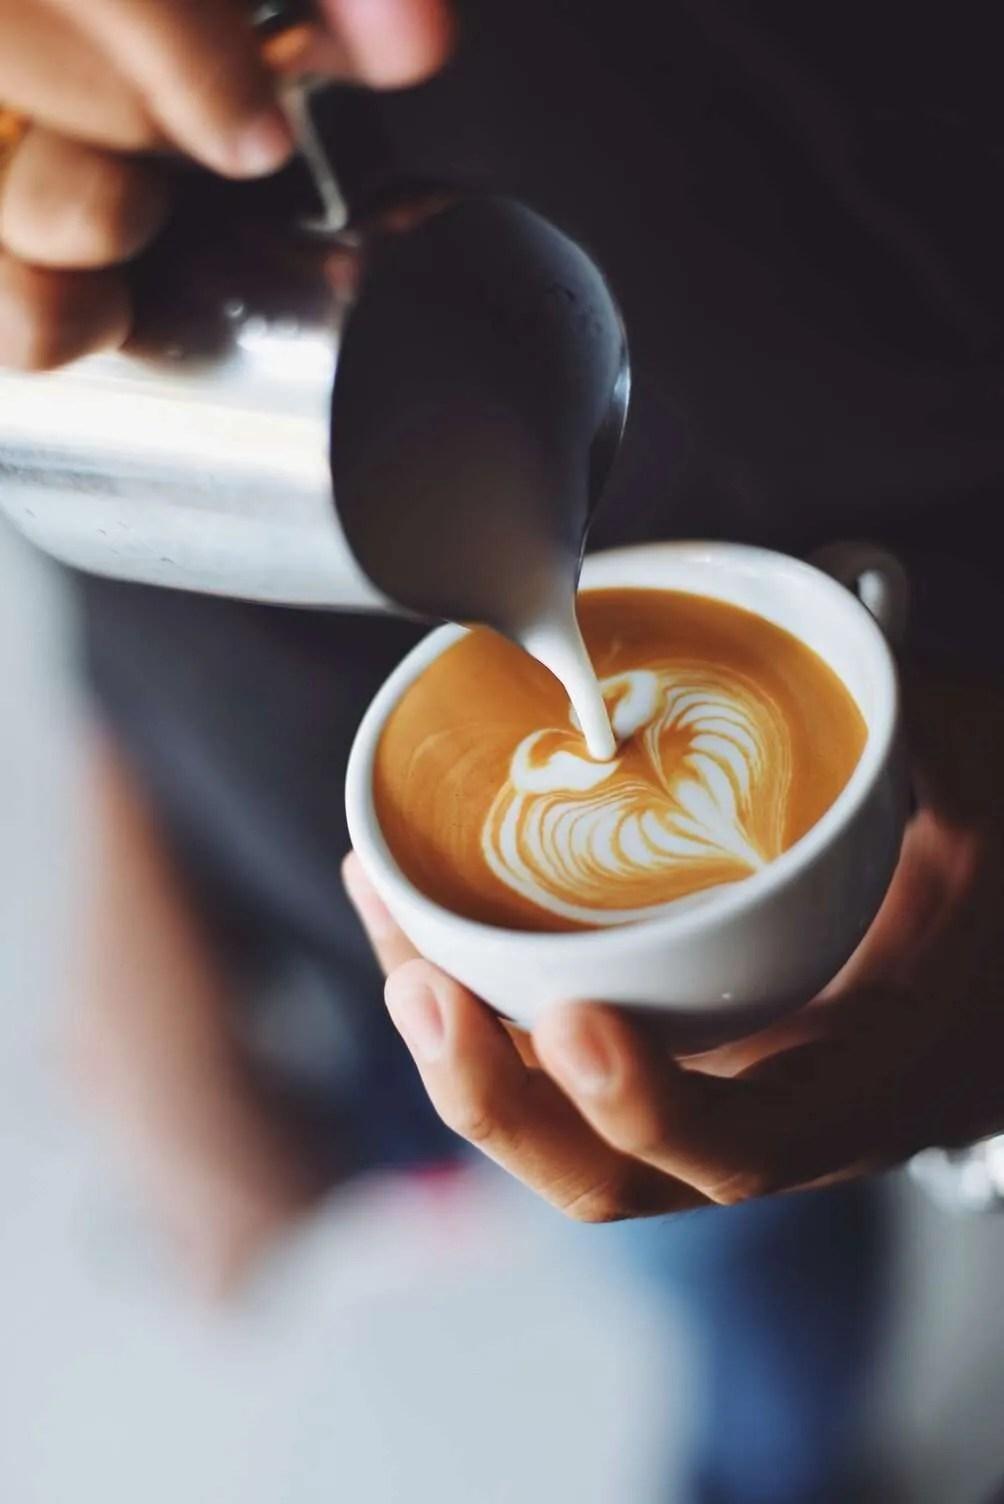 a-cup-of-coffee.jpg?fit=1004%2C1504&ssl=1